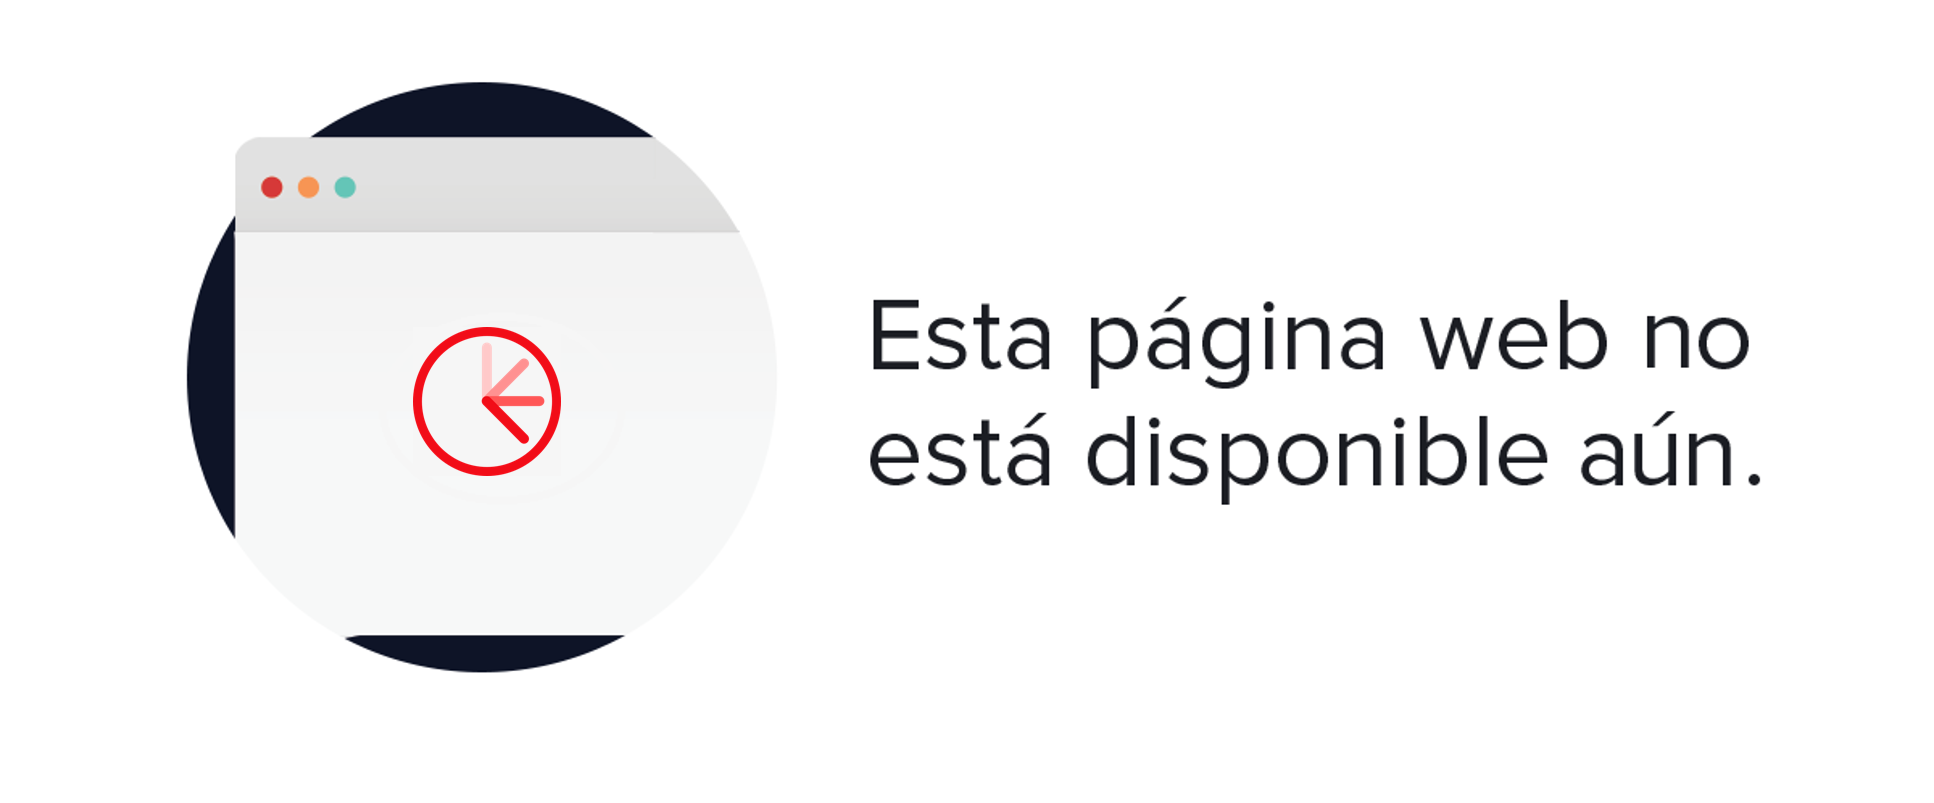 Boutique Moschino - Chaqueta negra de mujer Boutique Moschino con crochet Negro 001089566200856038 - CNYENOP